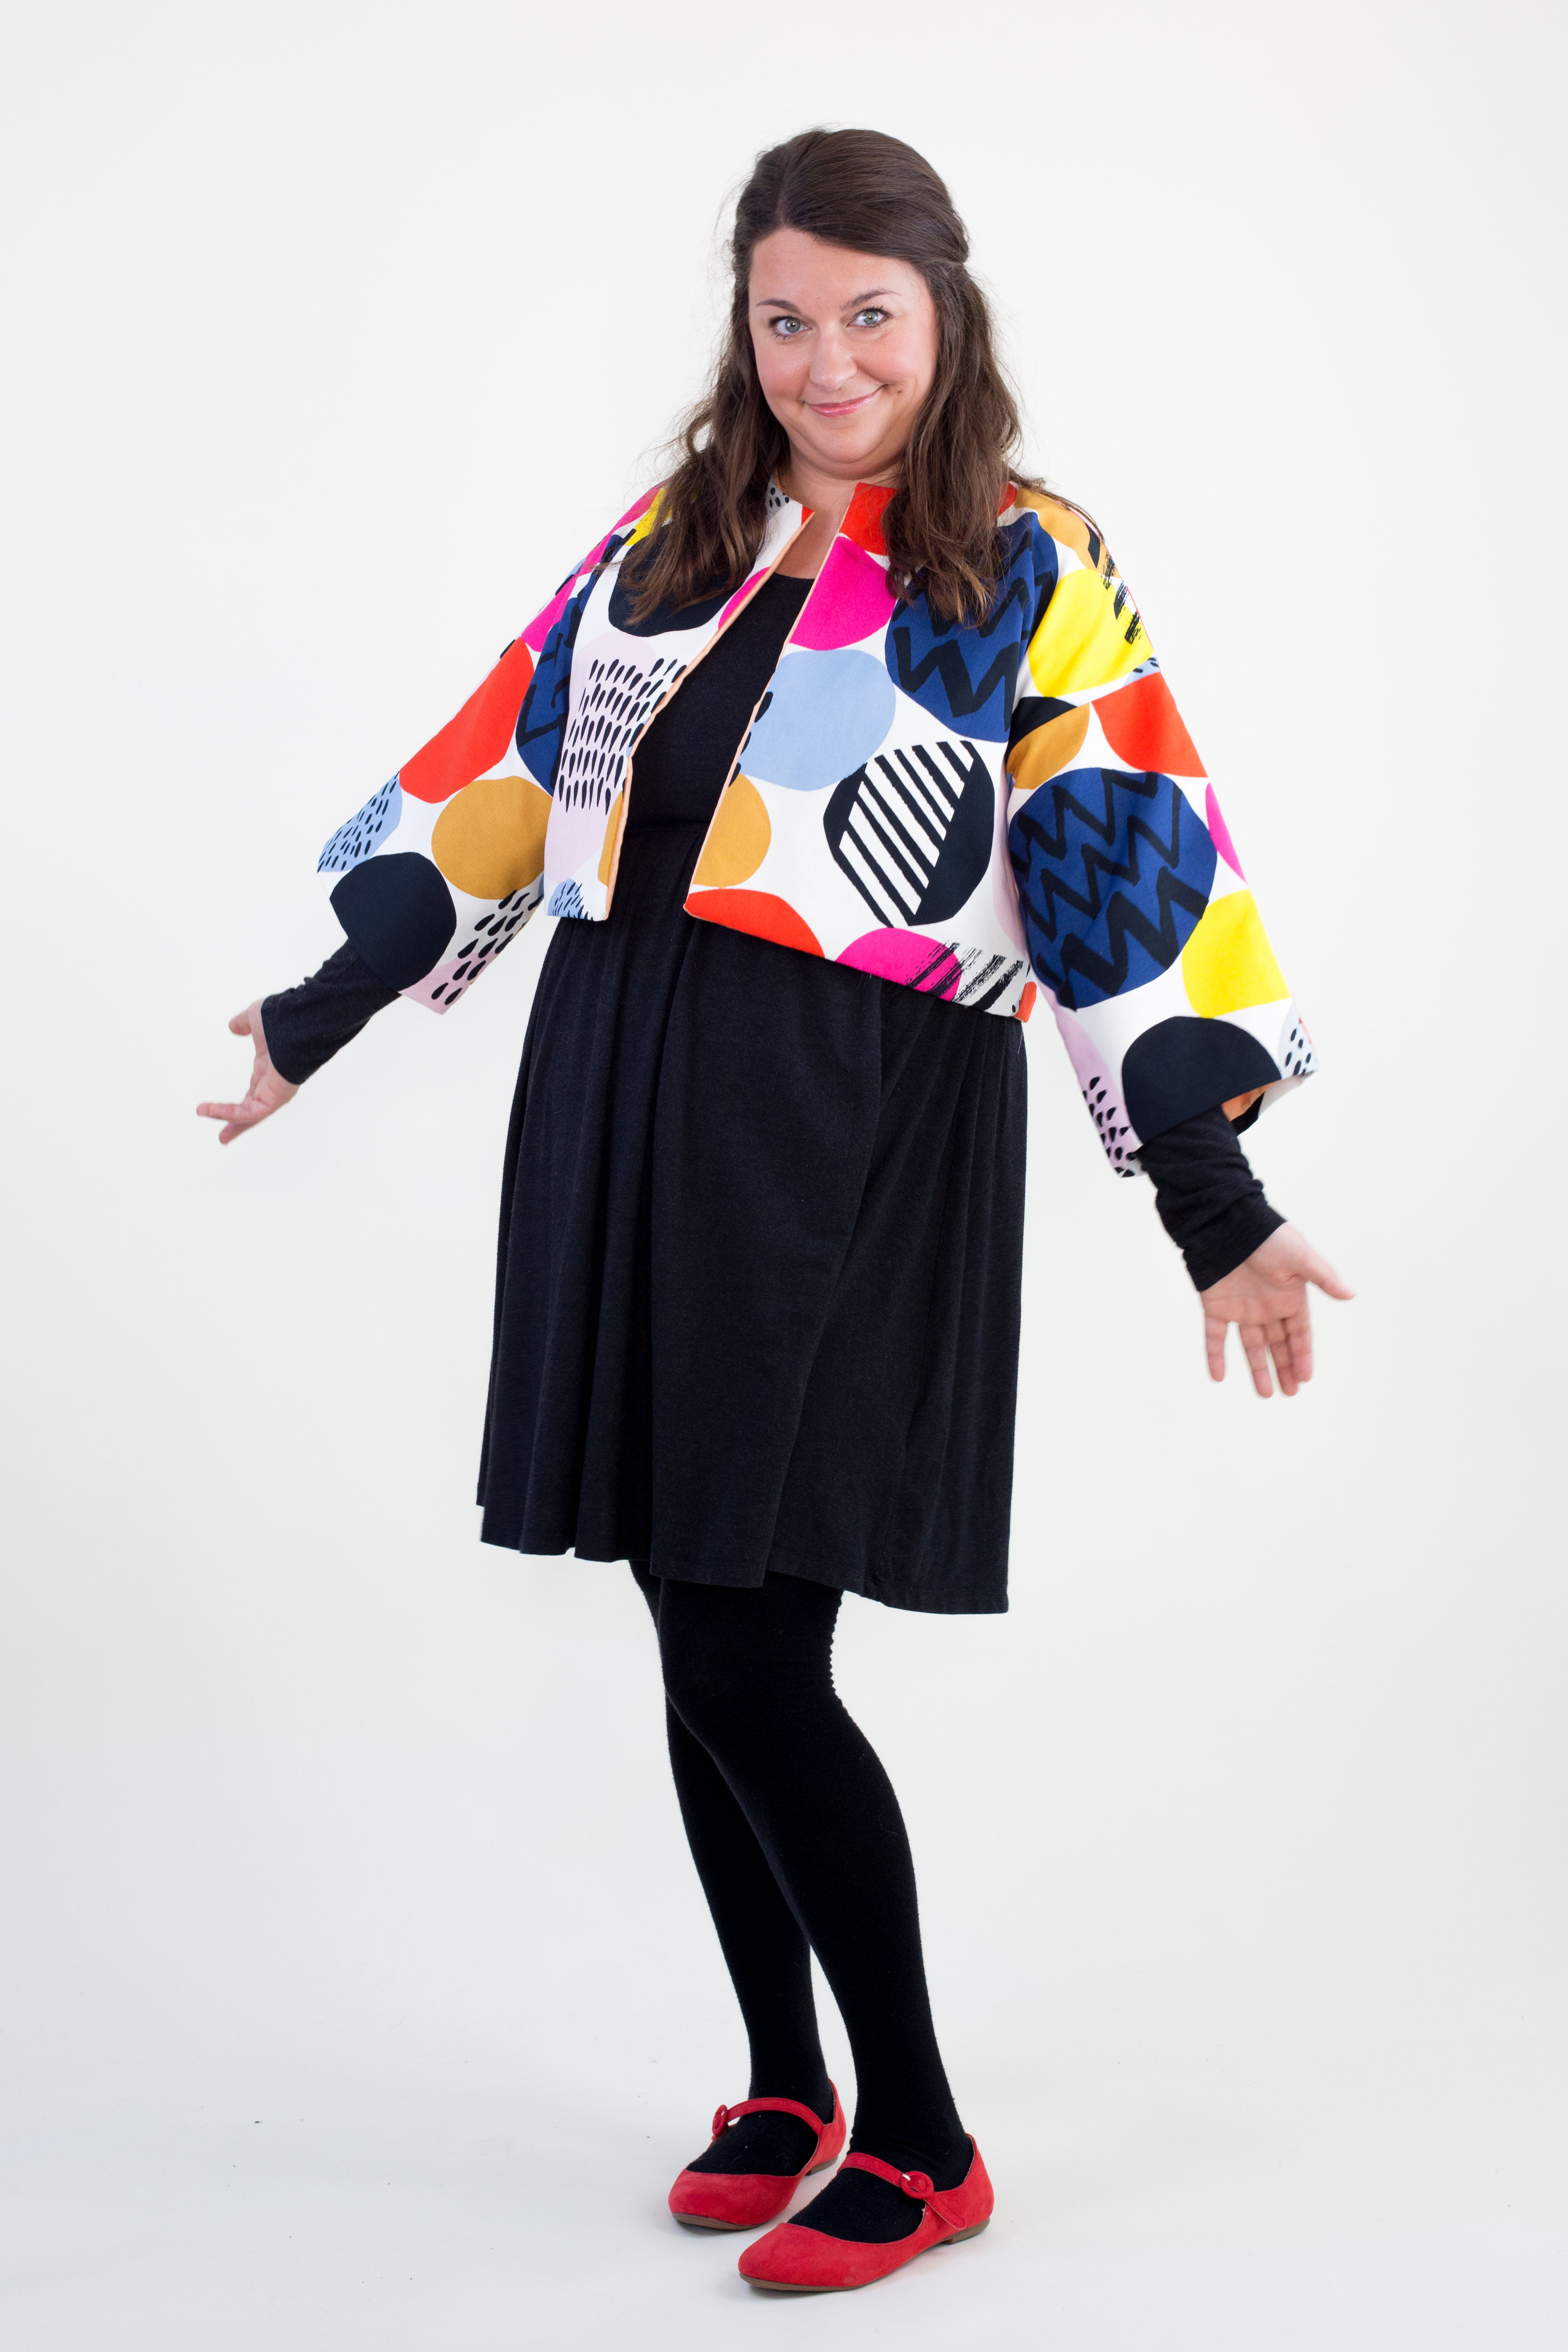 skandimama karoline hughes ikea print jacket